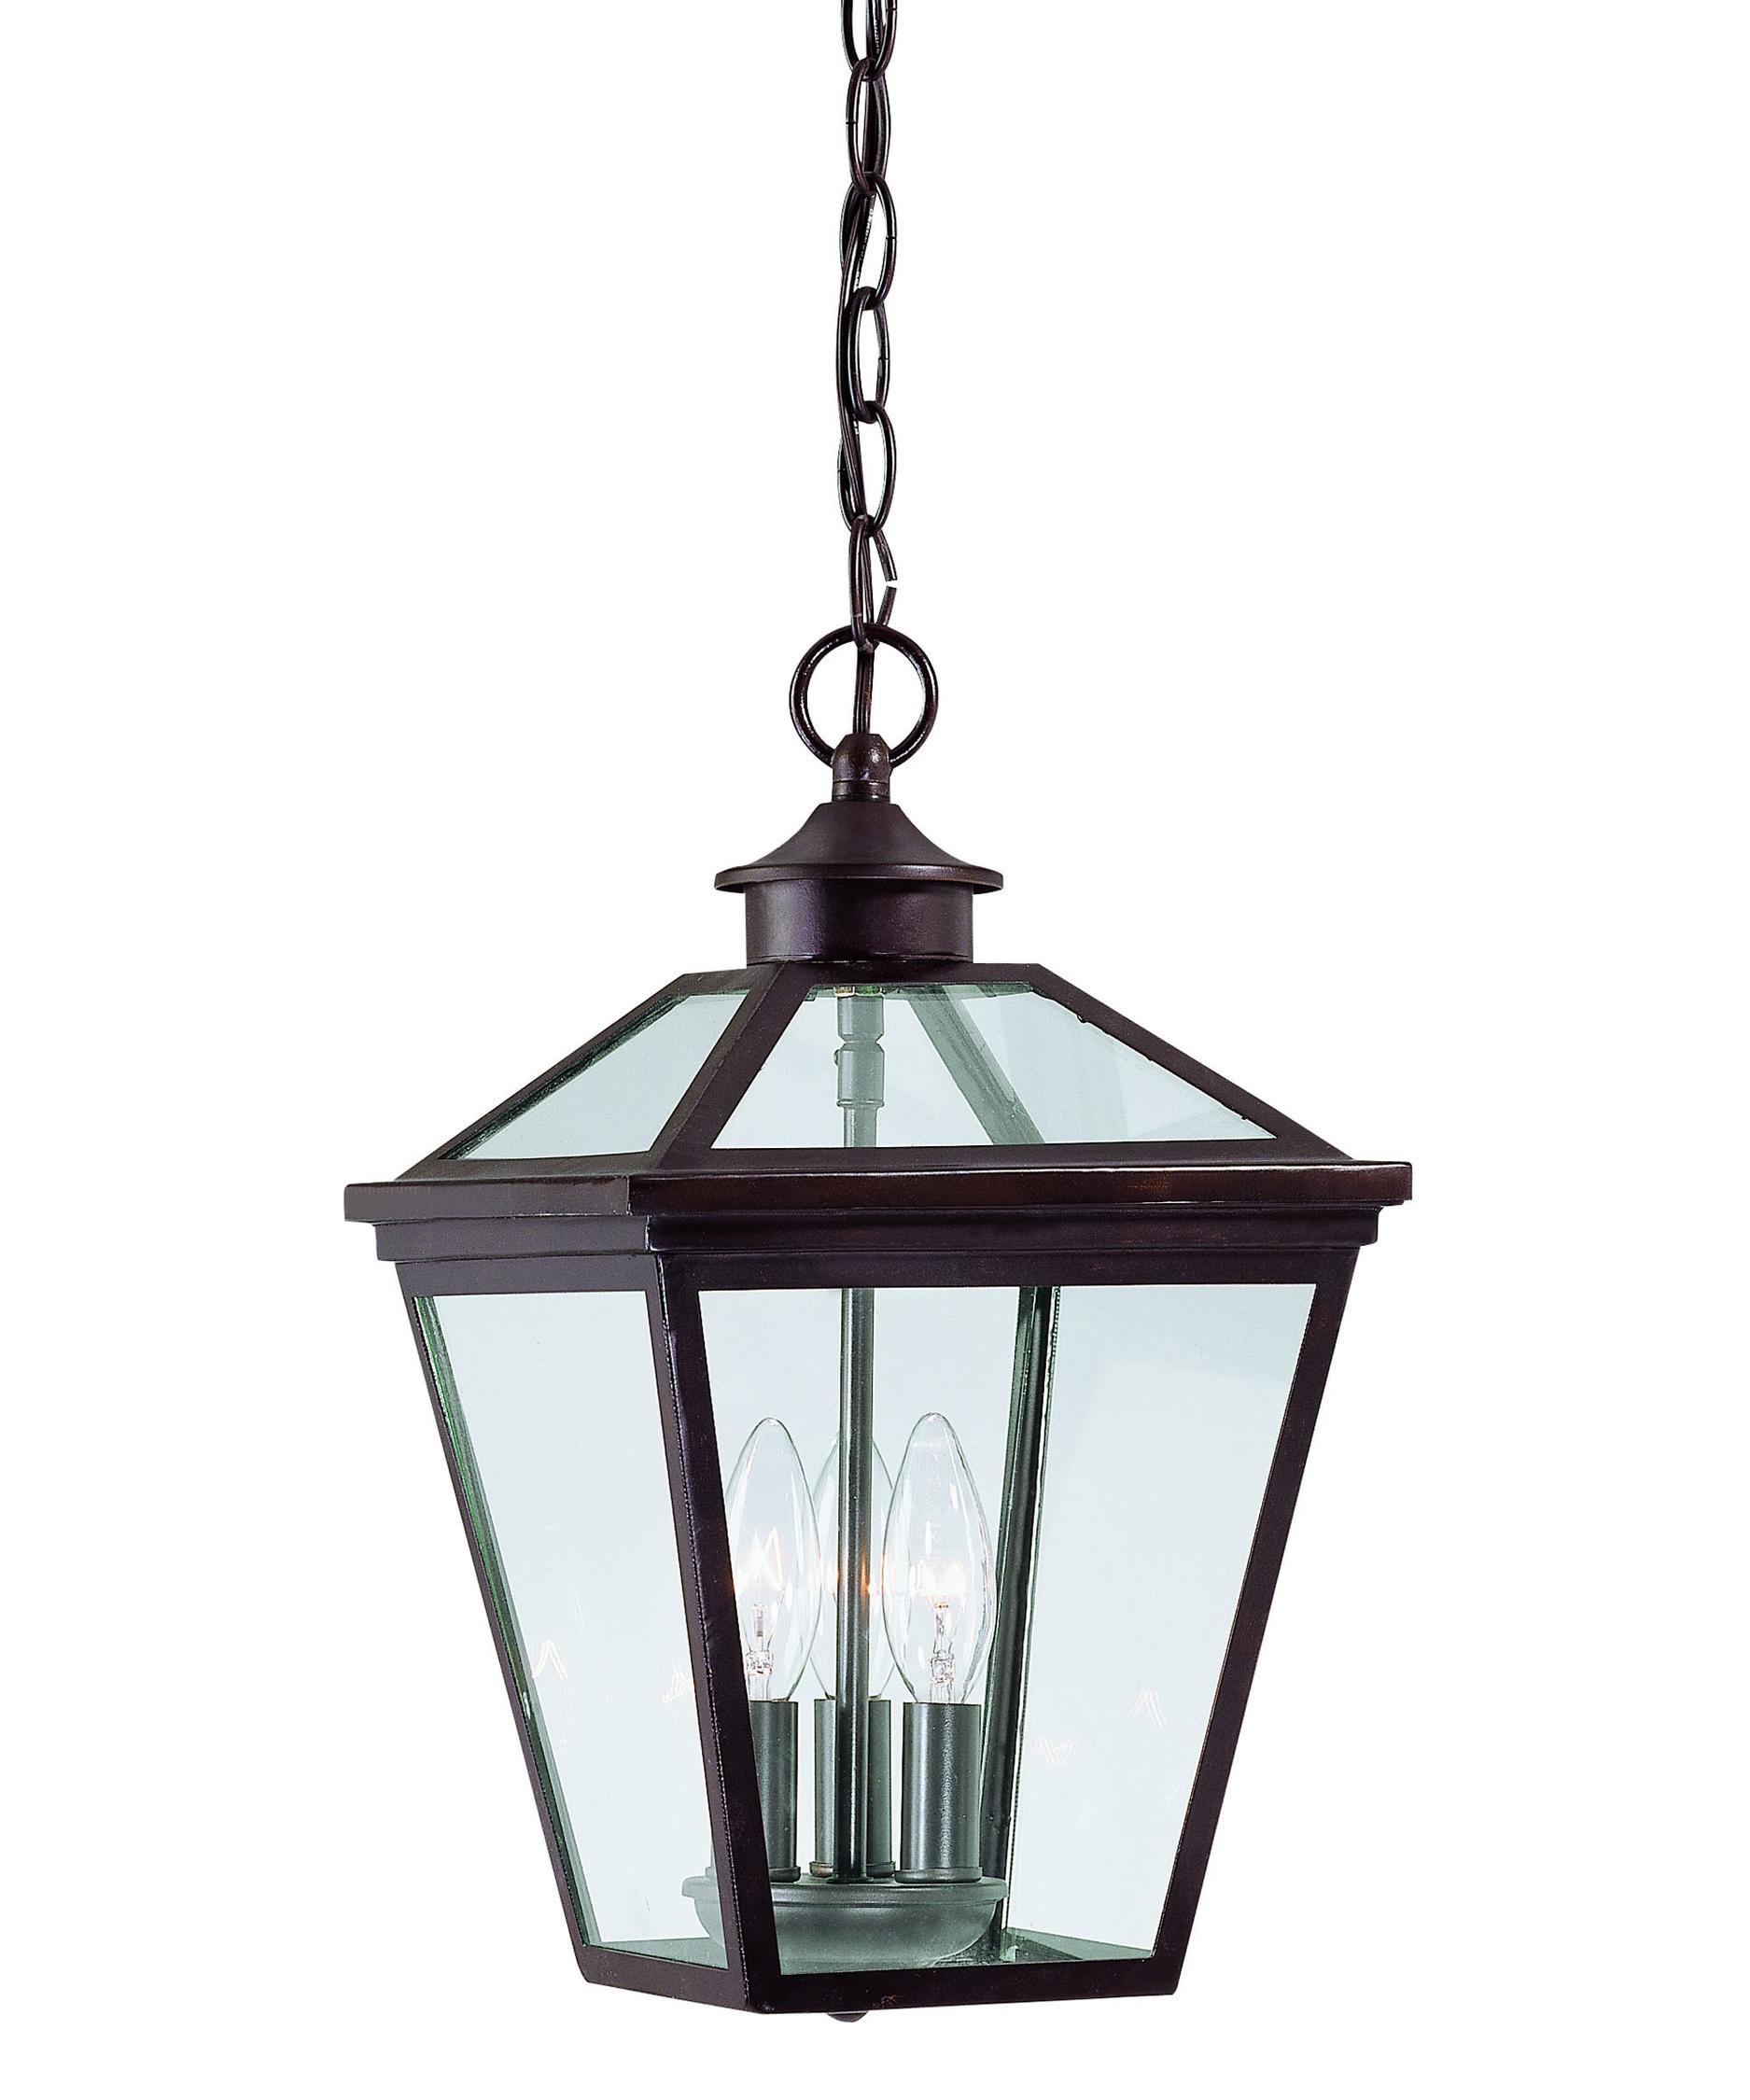 Outdoor hanging lighting - Savoy House 5 146 13 Ellijay 9 Inch Wide 3 Light Outdoor Hanging Lantern Capitol Lighting 1 800lighting Com